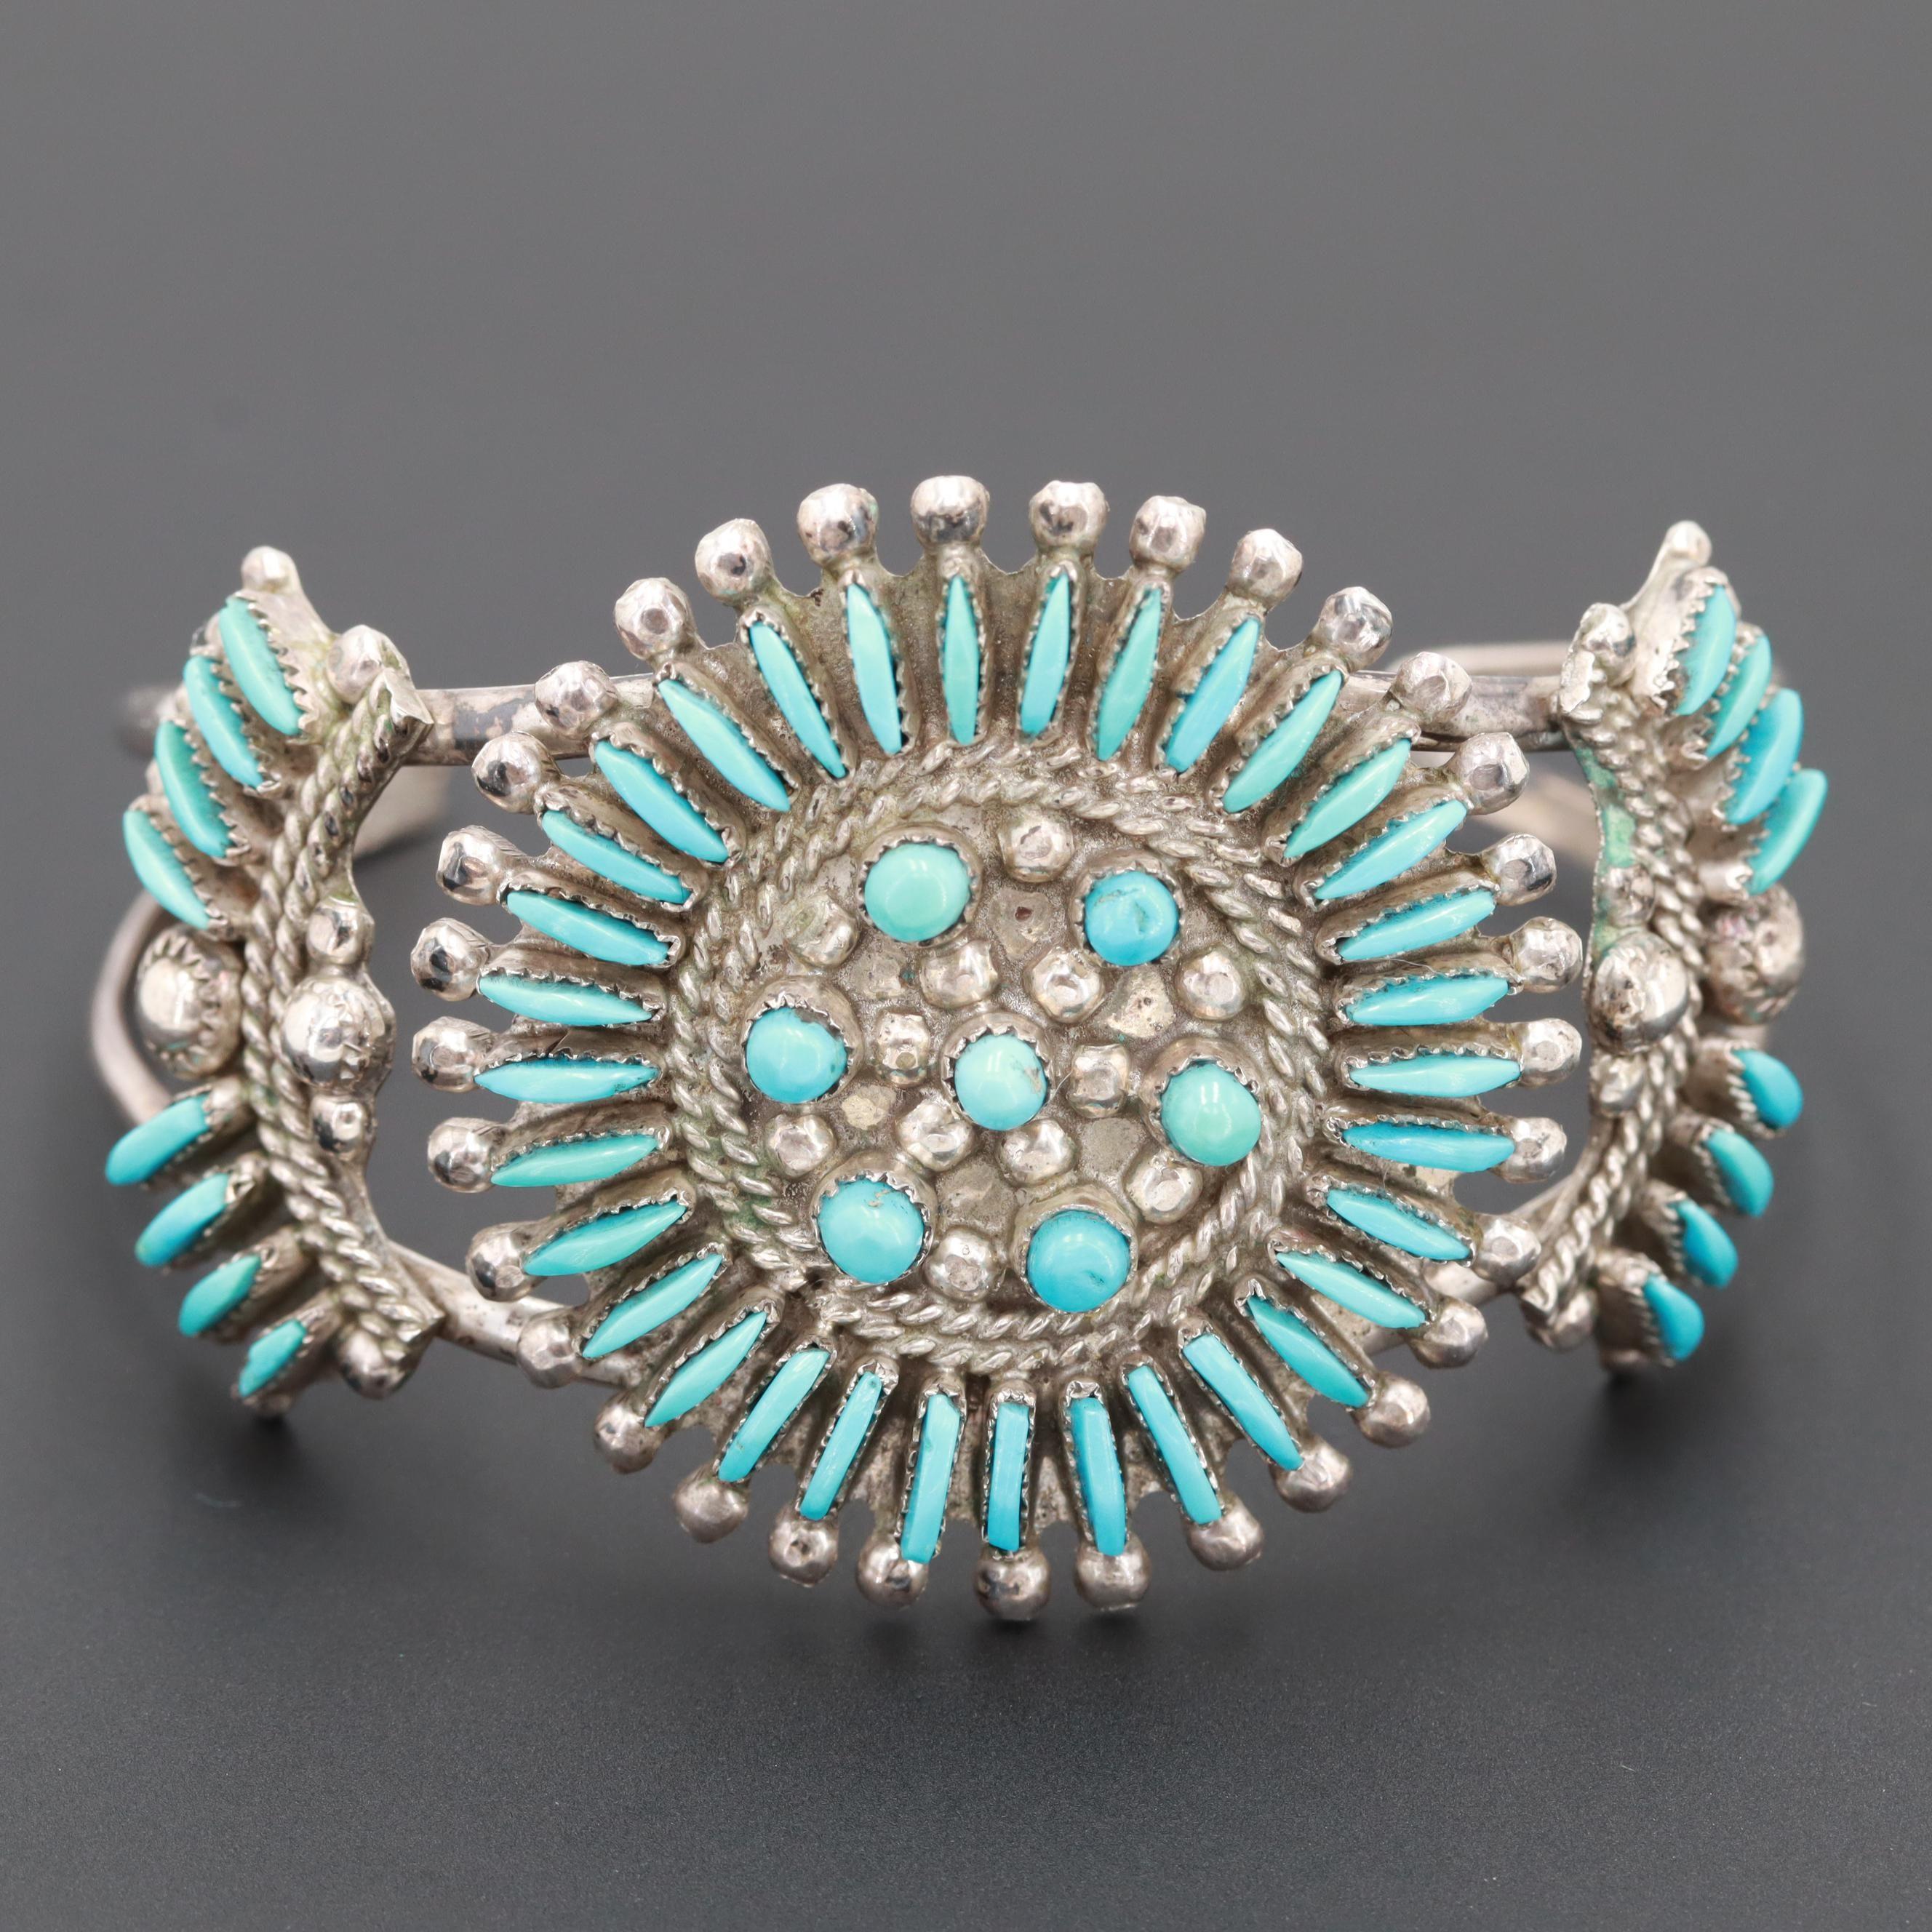 Southwestern Style 900 Silver Turquoise Cuff Bracelet